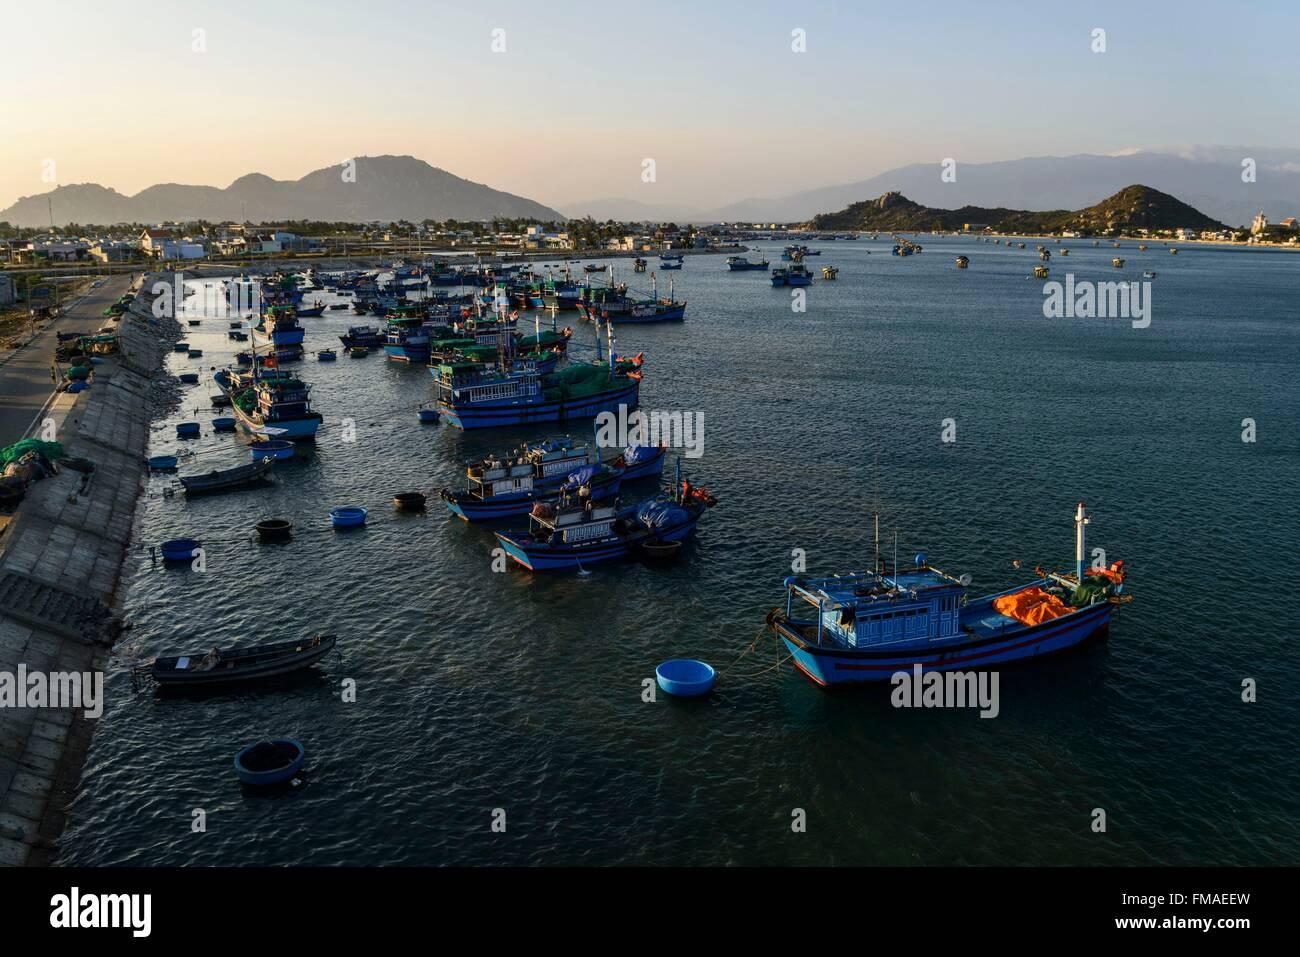 Vietnam, Ninh Thuan province, Phan Rang, le port de pêche Photo Stock